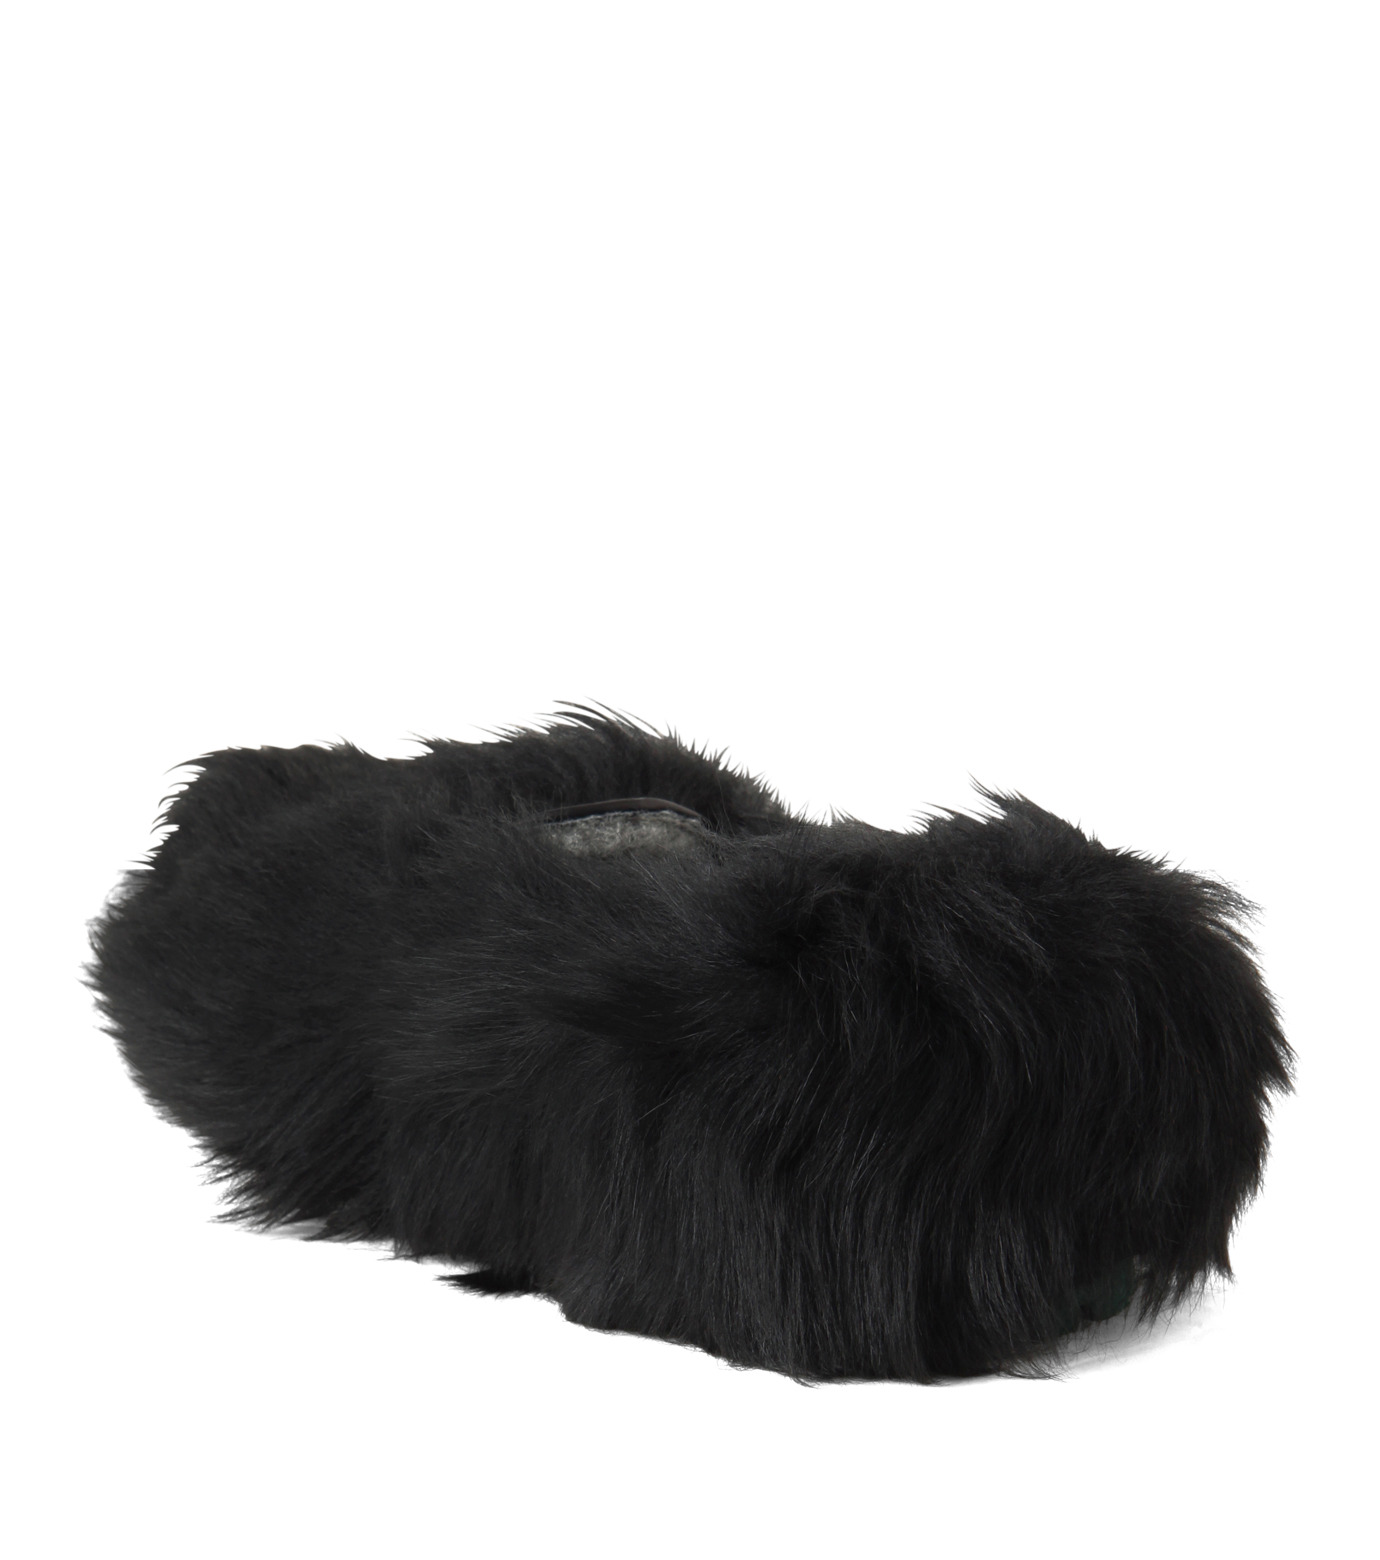 ACNE STUDIOS(アクネ ストゥディオズ)のBalto Fur Slipon-BLACK(シューズ/shoes)-2E0144-13 拡大詳細画像3